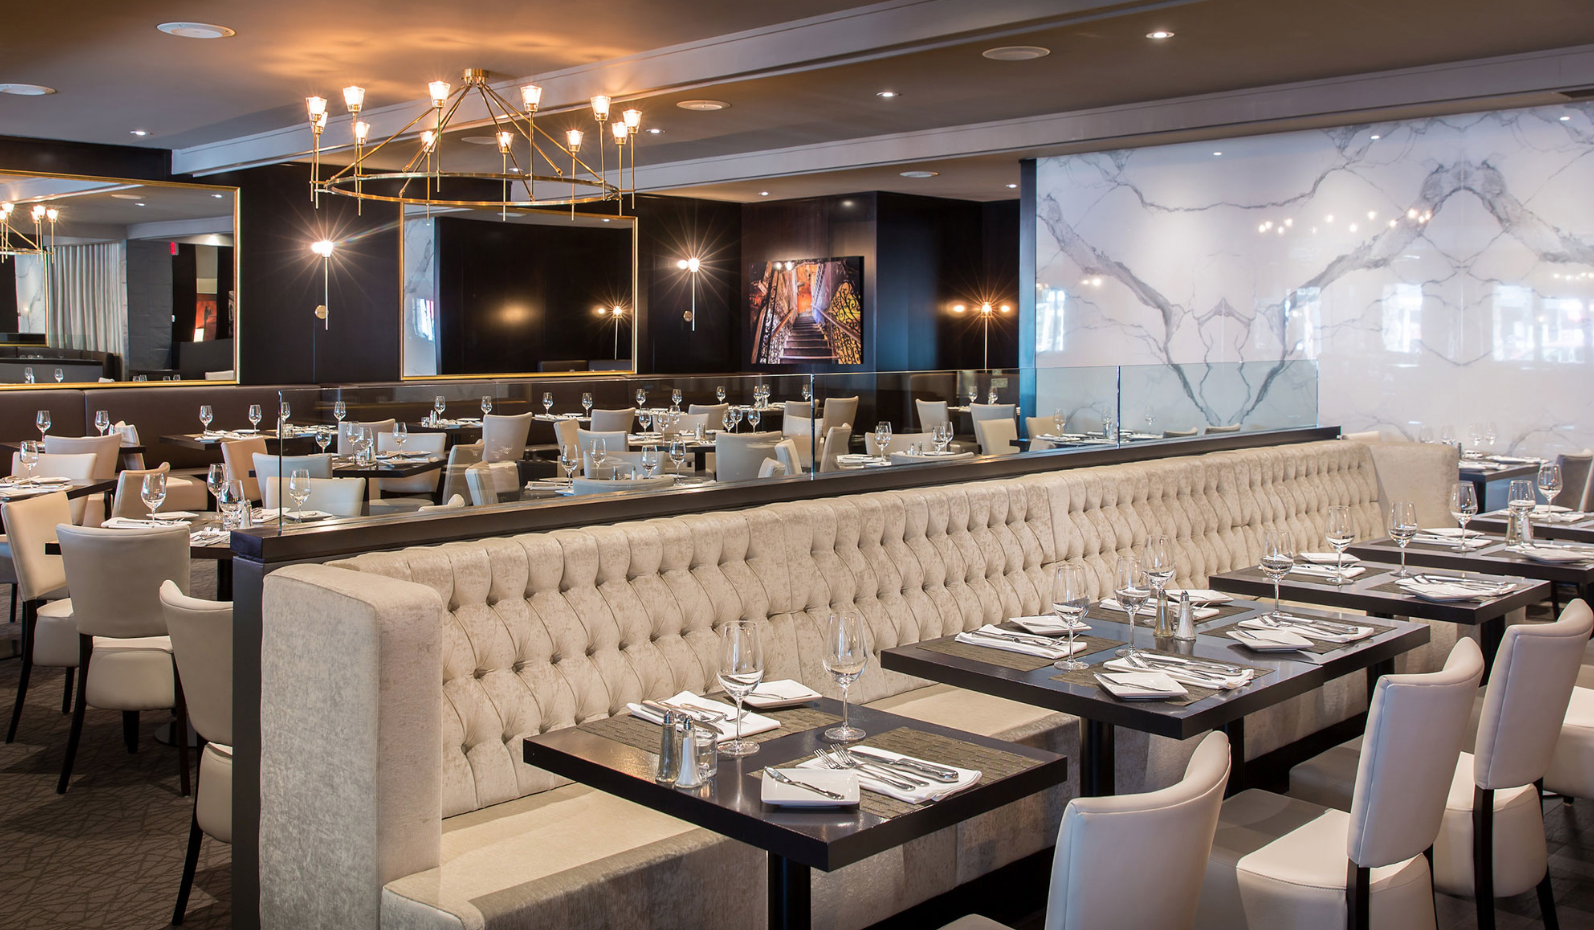 Restaurant and bar interior design firm ottawa sfda